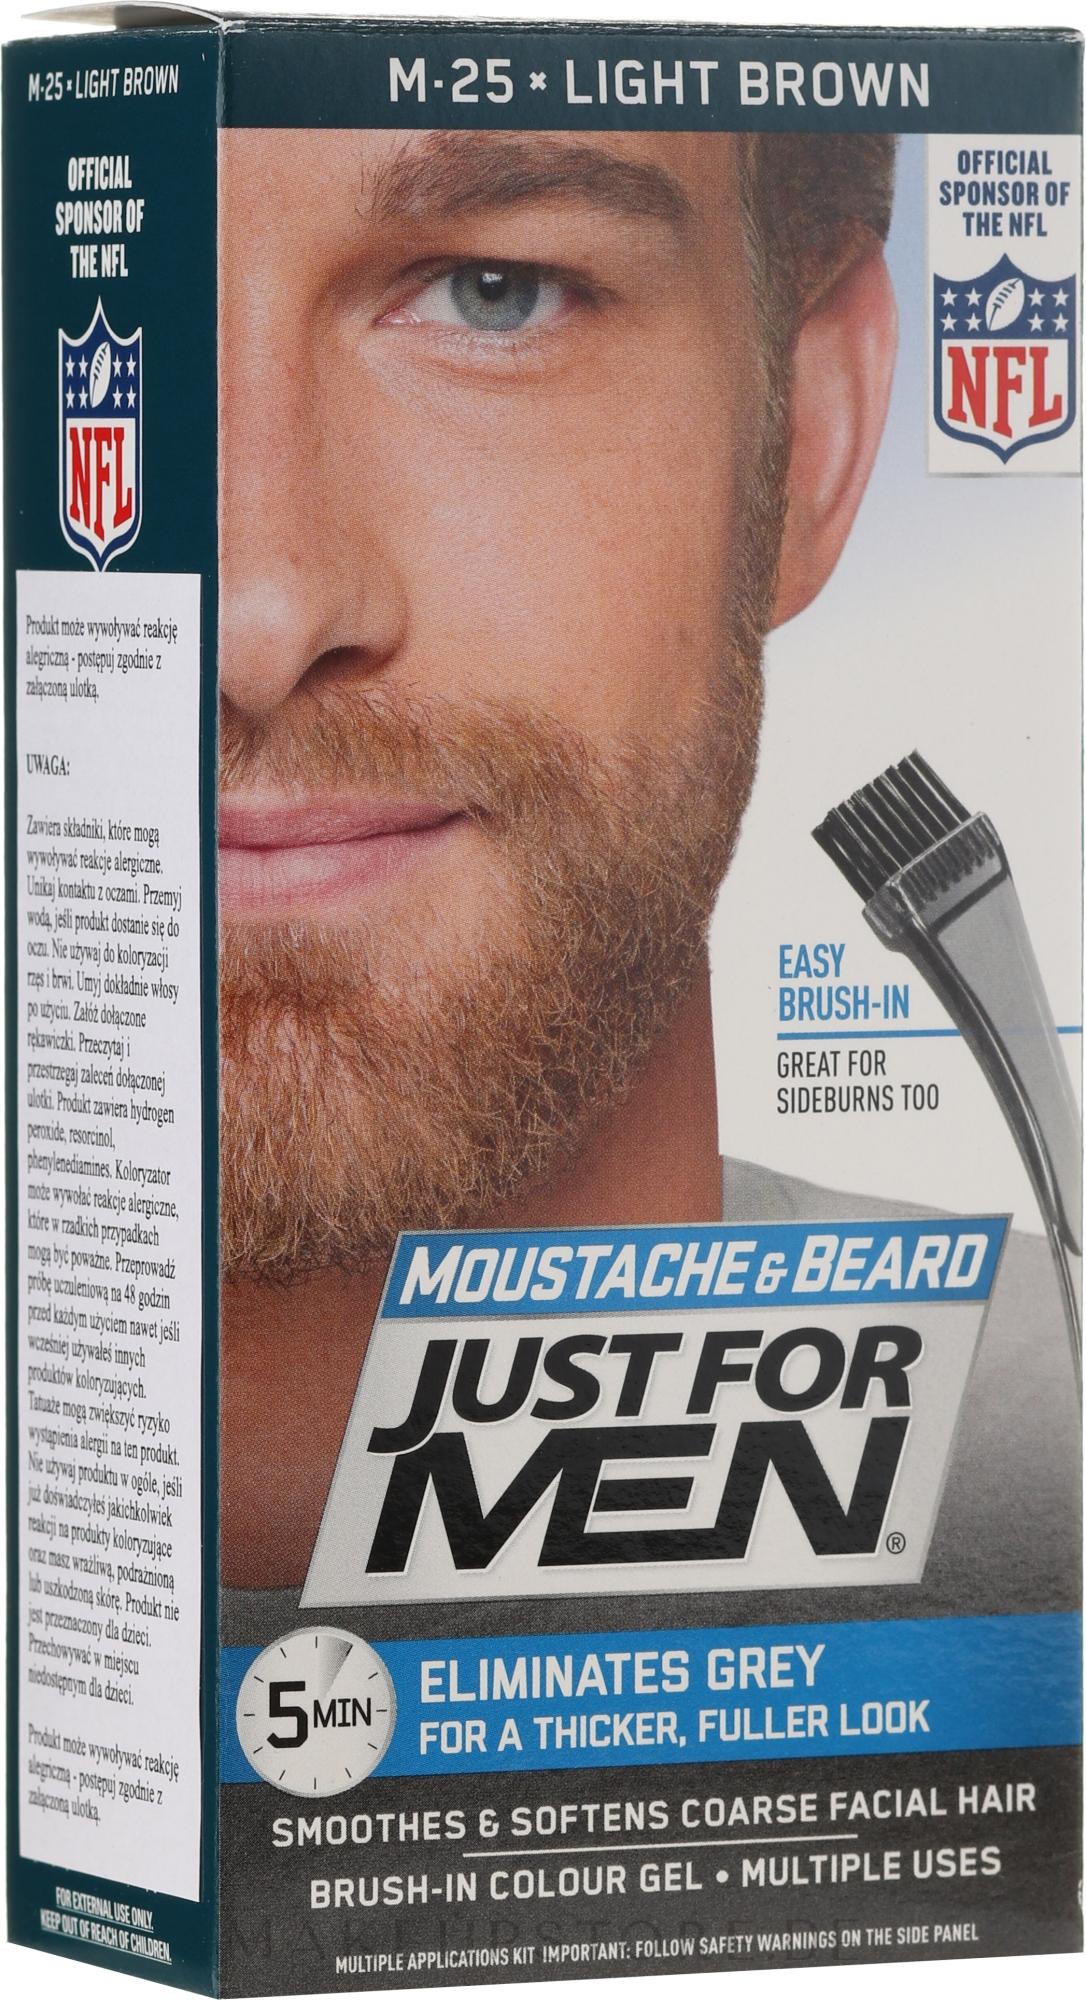 Just For Men Moustache & Beardd - Pinsel-Farbgel für